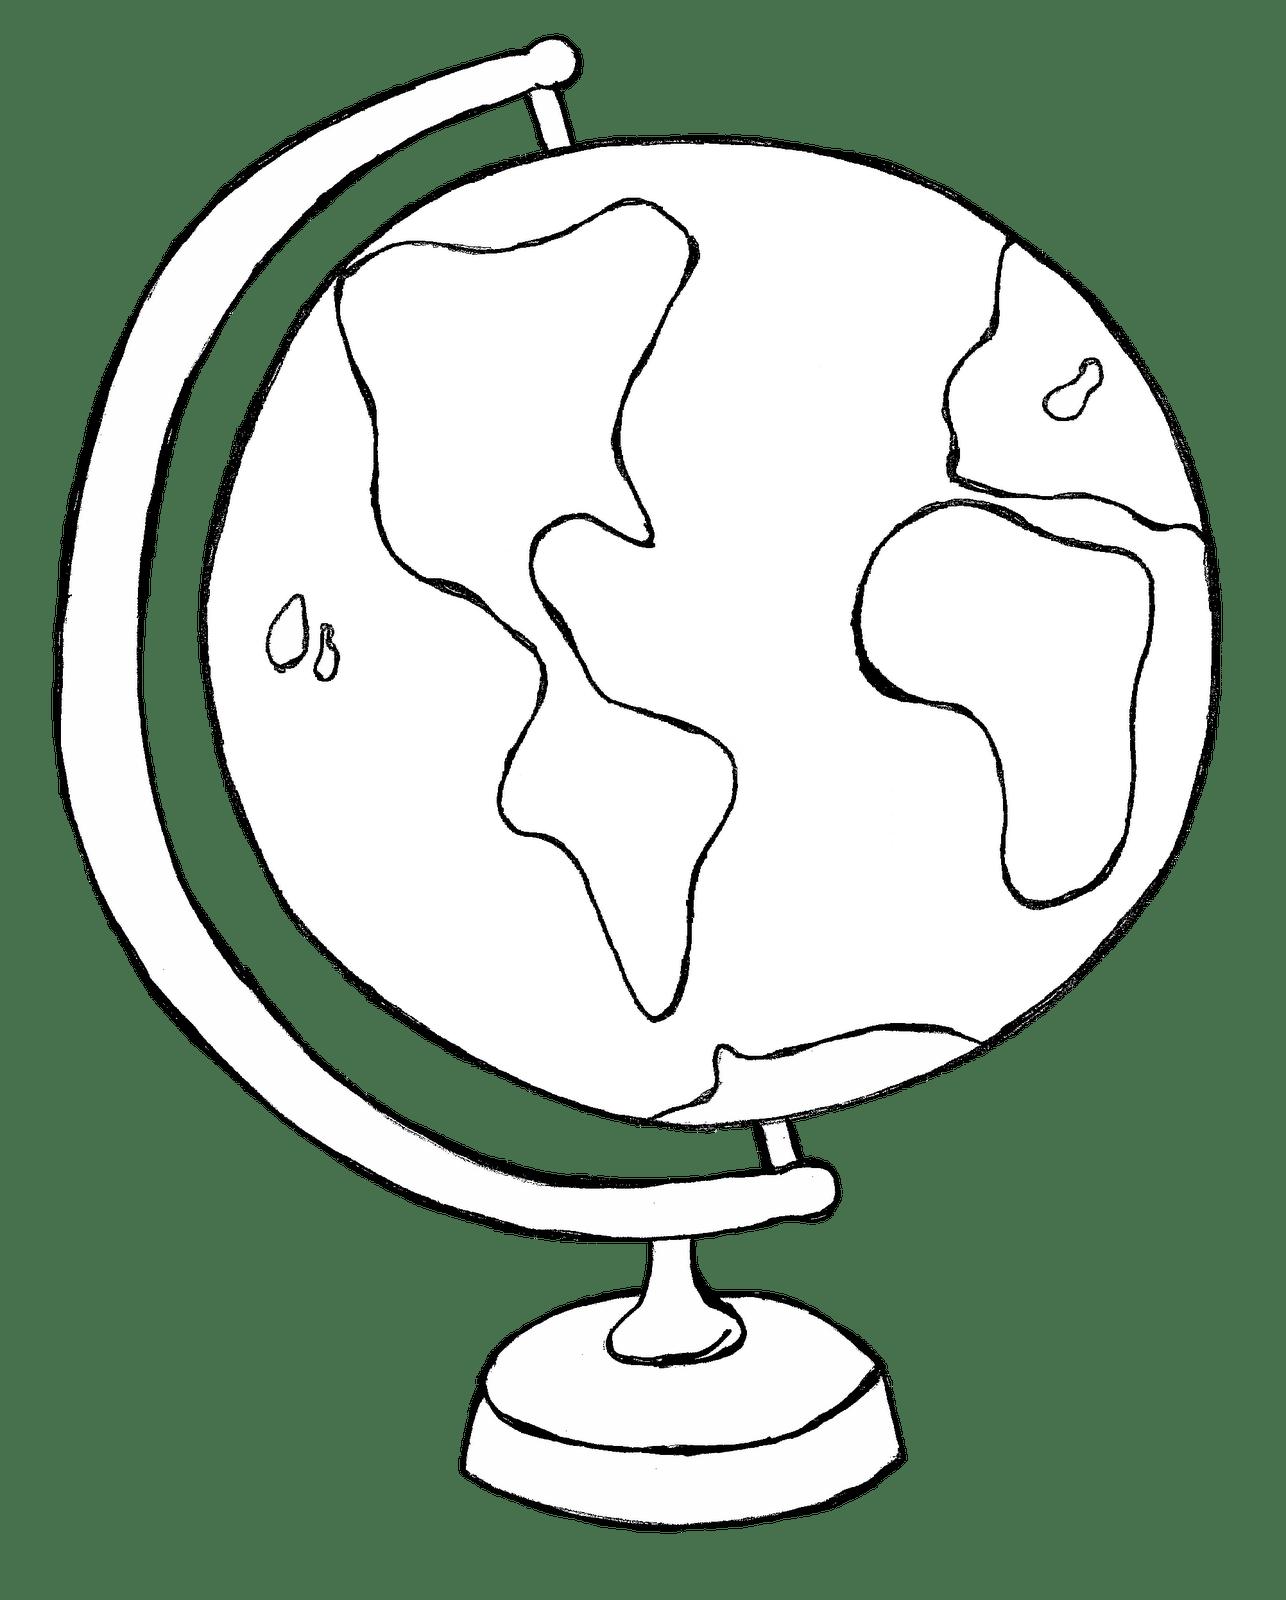 Globe Clipart Black And White Clipart Panda